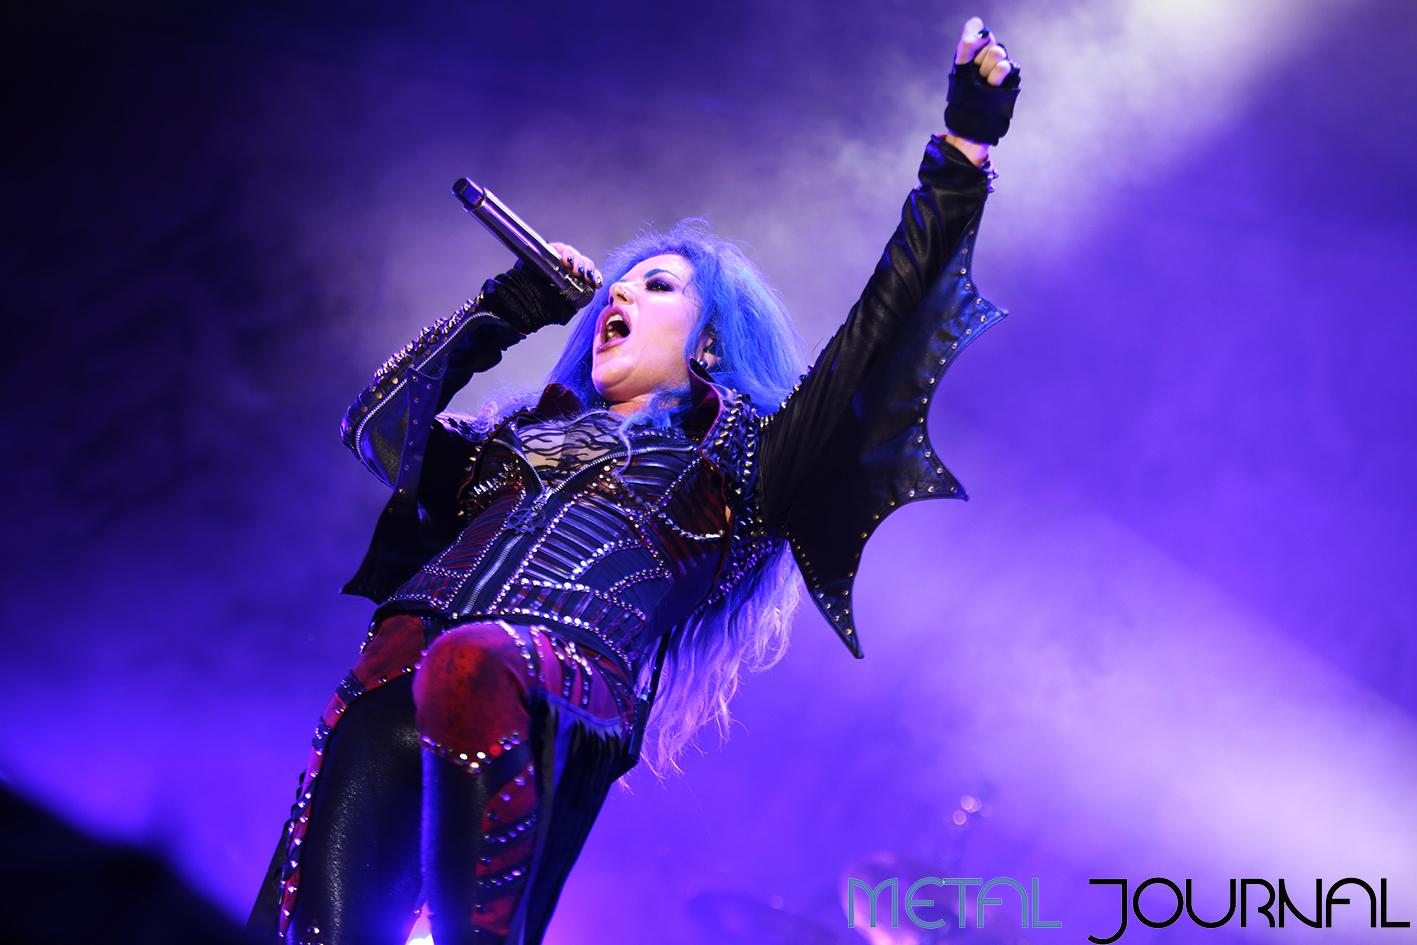 arch enemy - metal journal rock fest barcelona 2019 pic 4